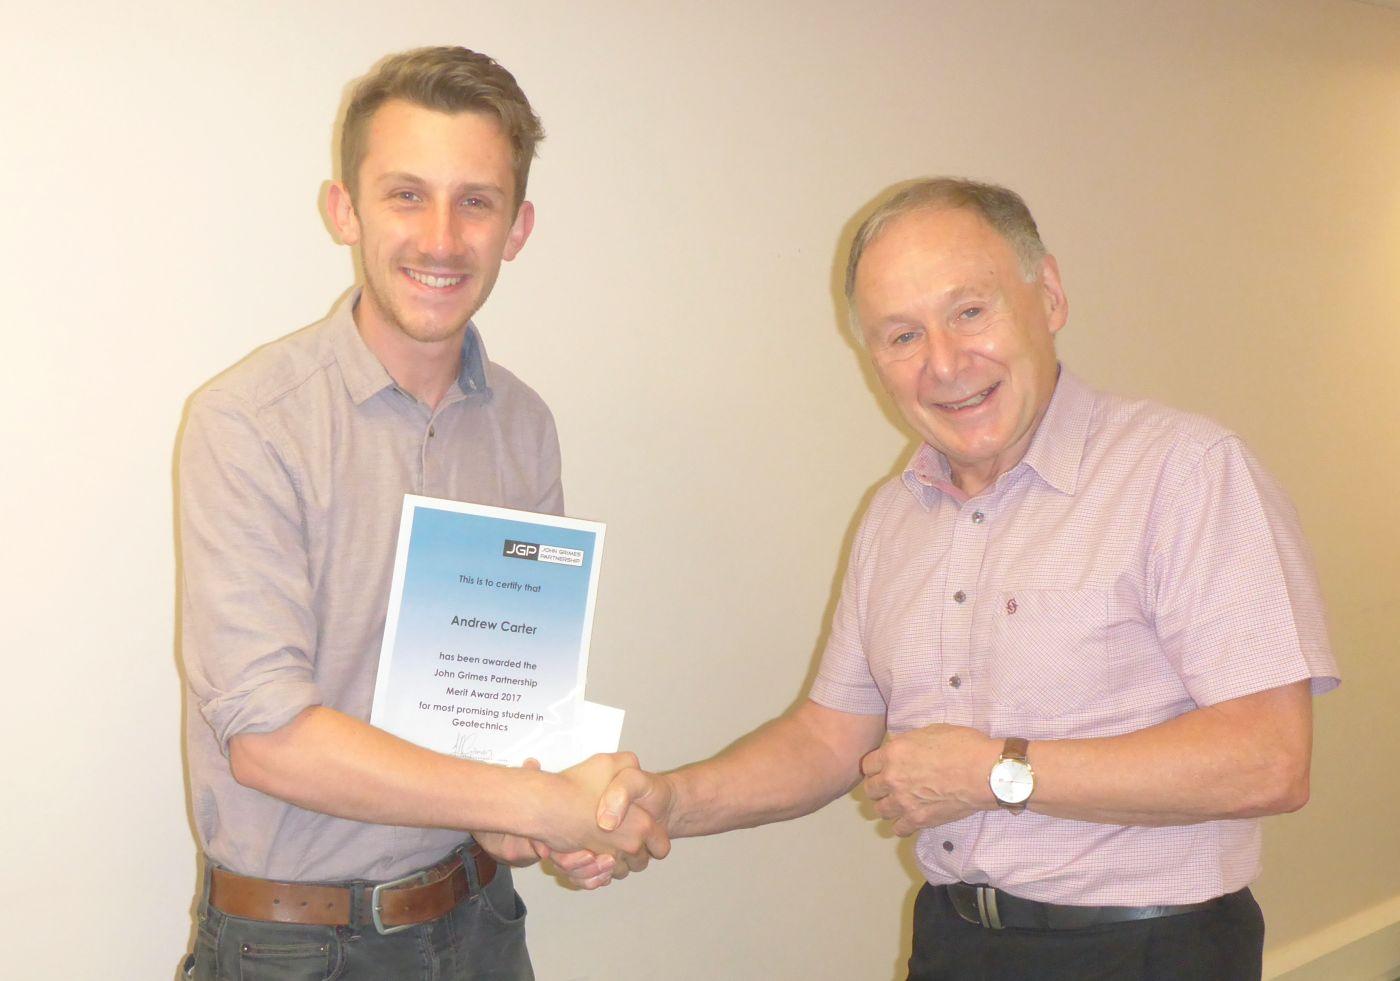 Geotechnics Student Merit Award